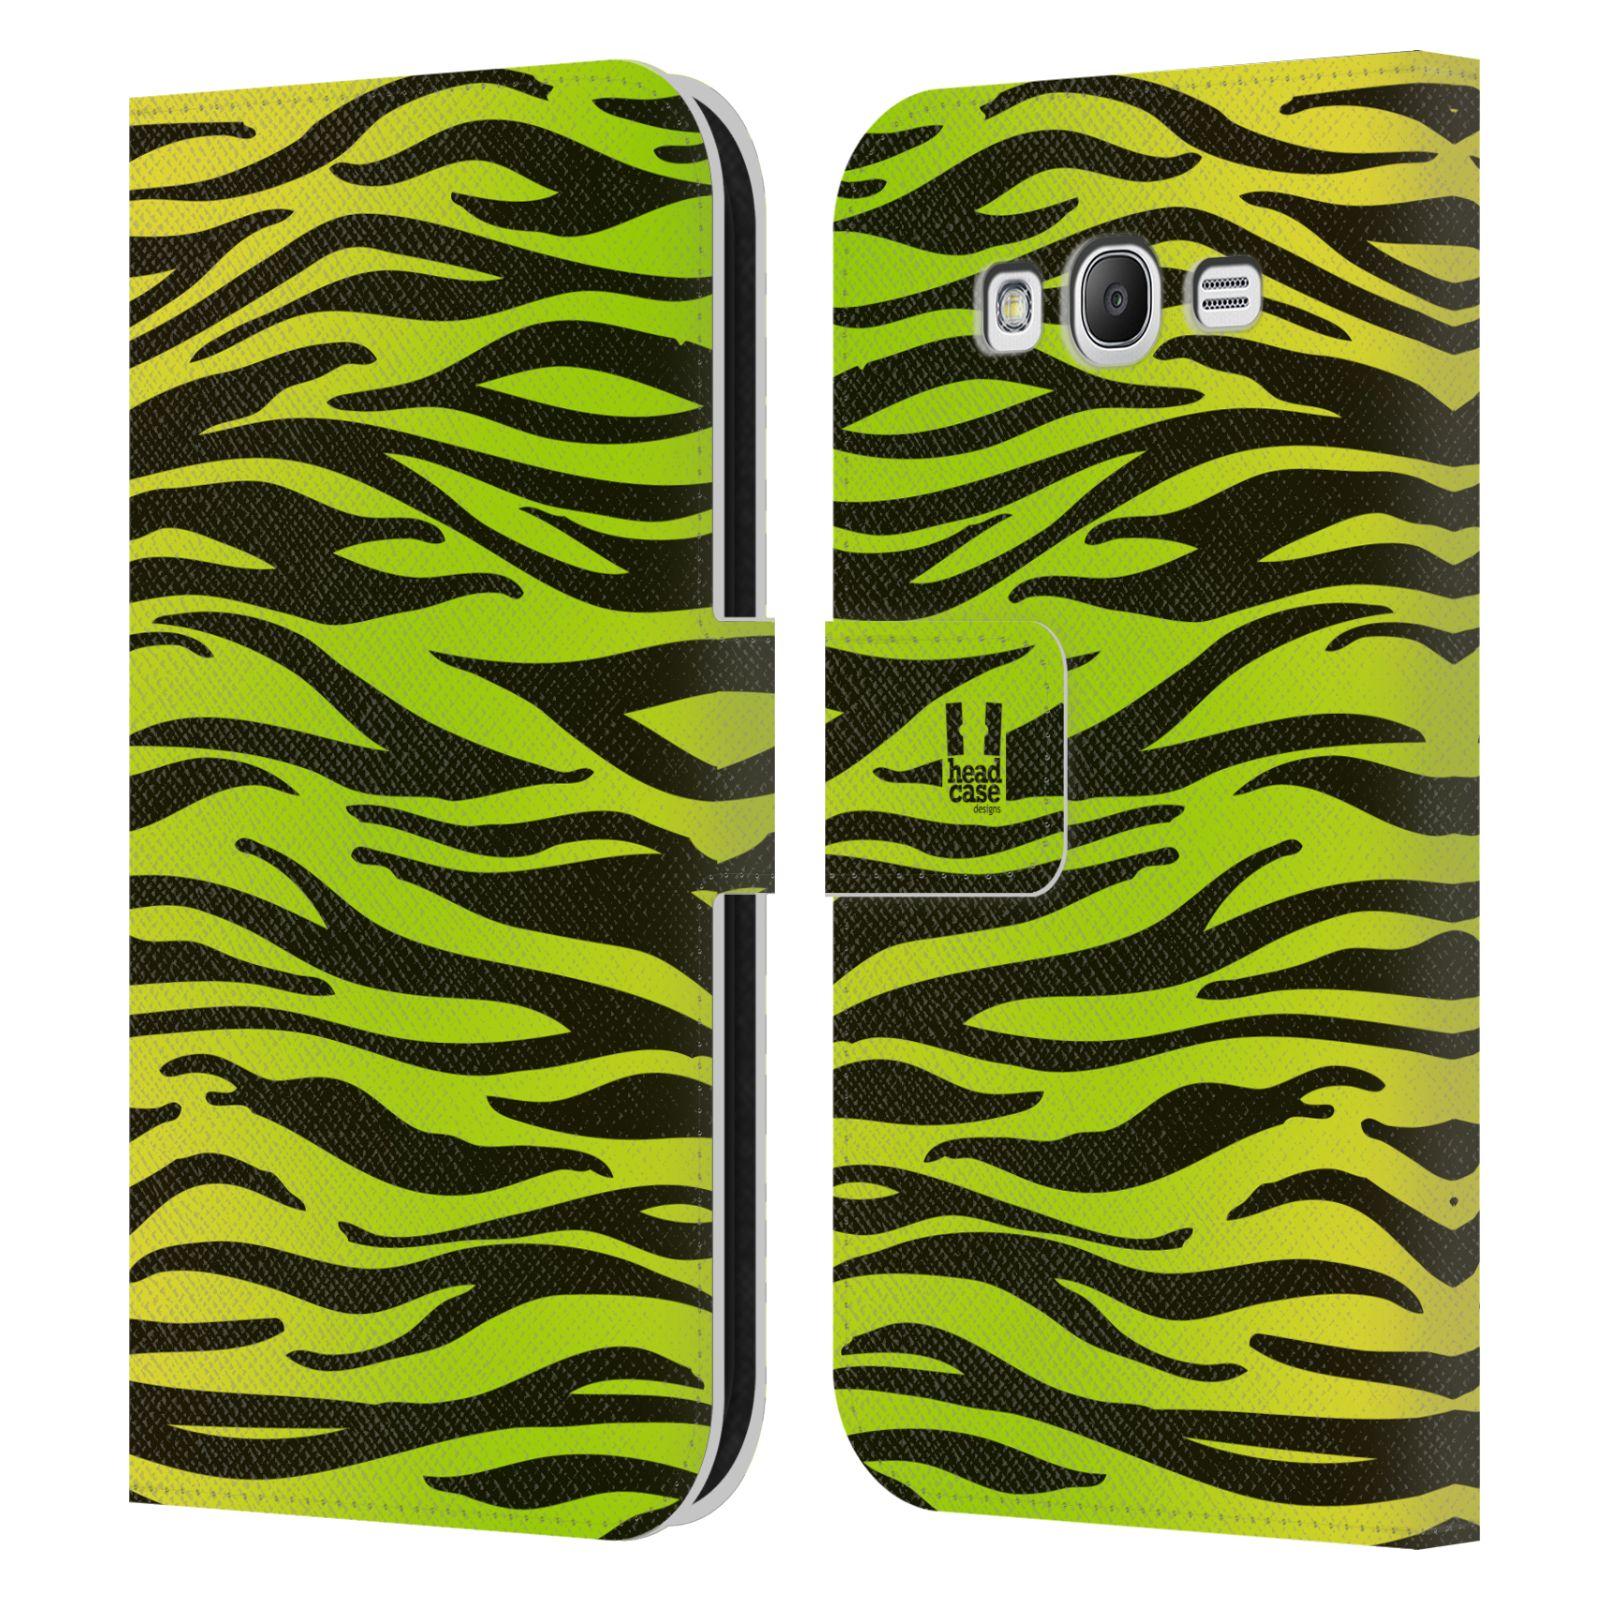 HEAD CASE Flipové pouzdro pro mobil Samsung Galaxy Grand i9080 Zvířecí barevné vzory žlutozelená zebra